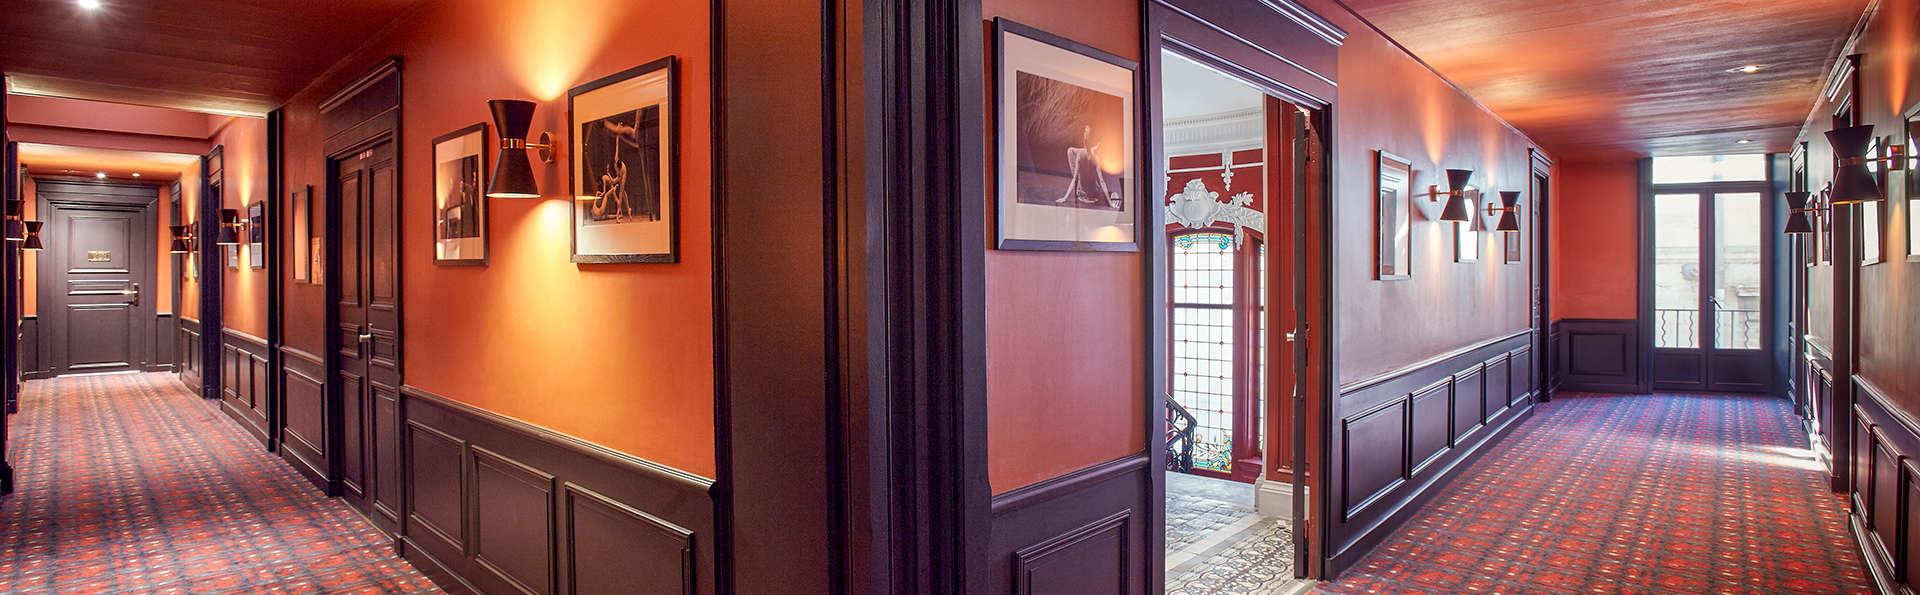 Grand Hôtel du Midi Montpellier - Opéra Comédie - edit_hall.jpg